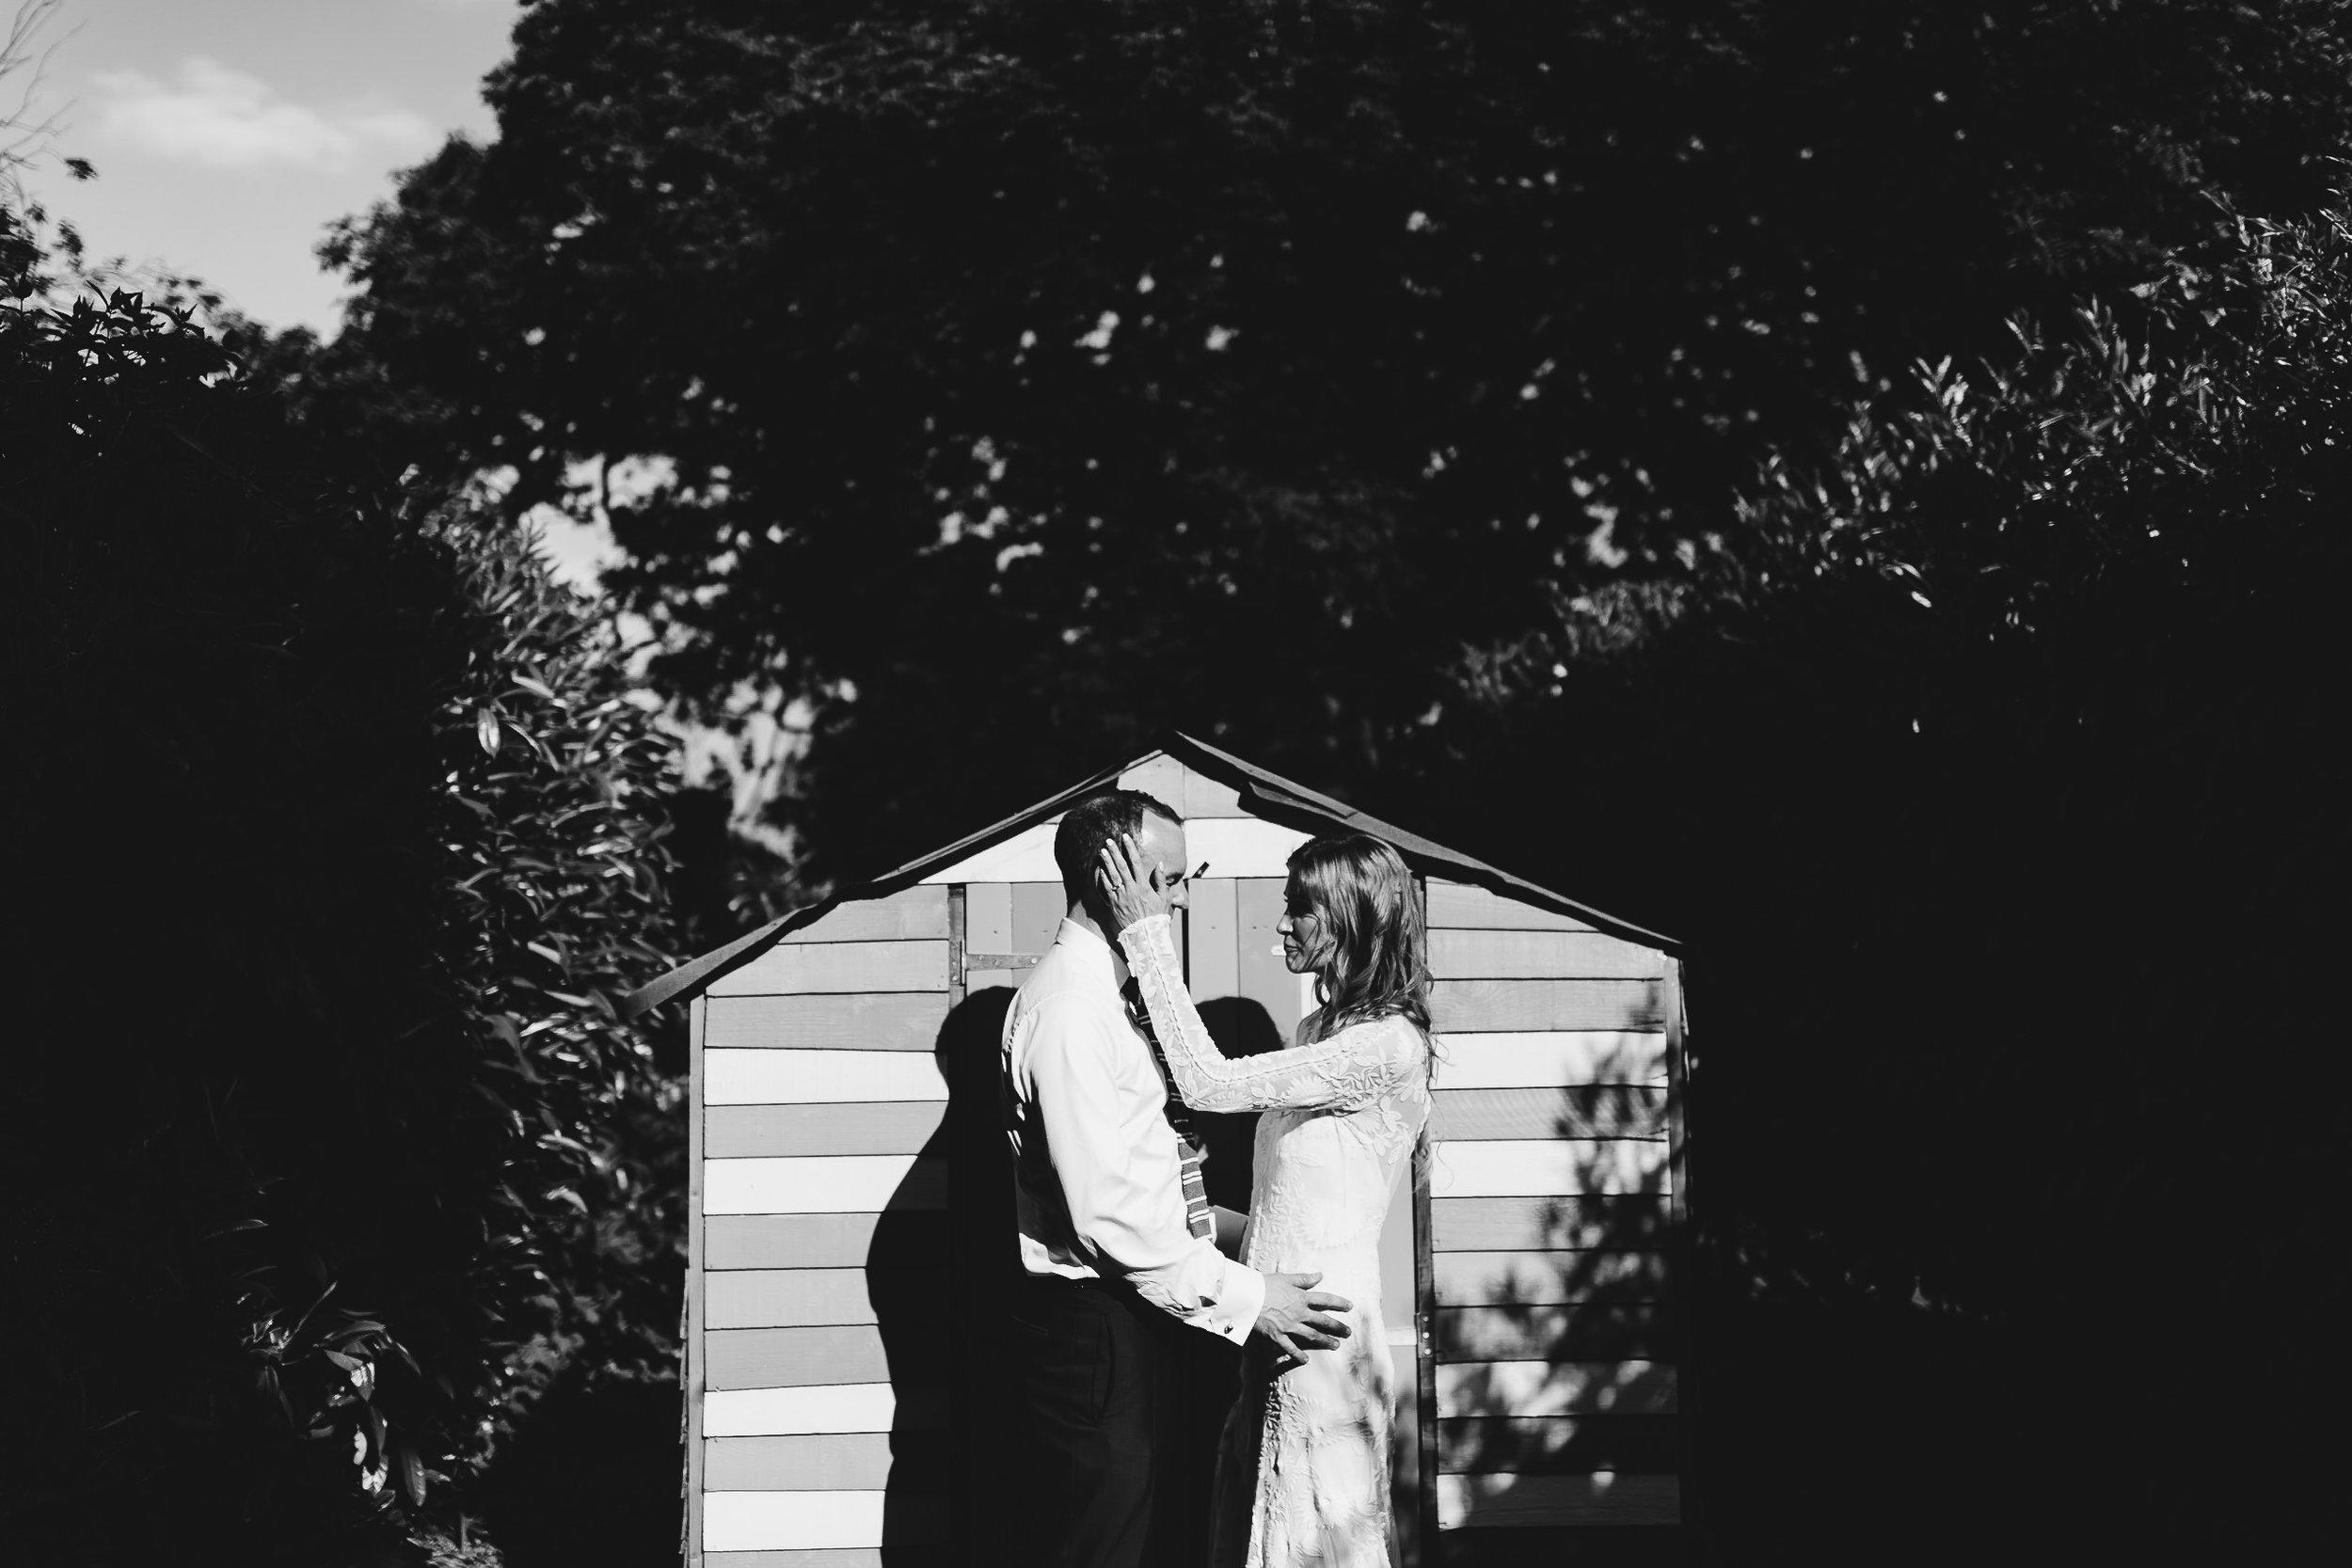 Roundhay-Leeds-Backyard-Wedding-Becs-Chris-184.jpg